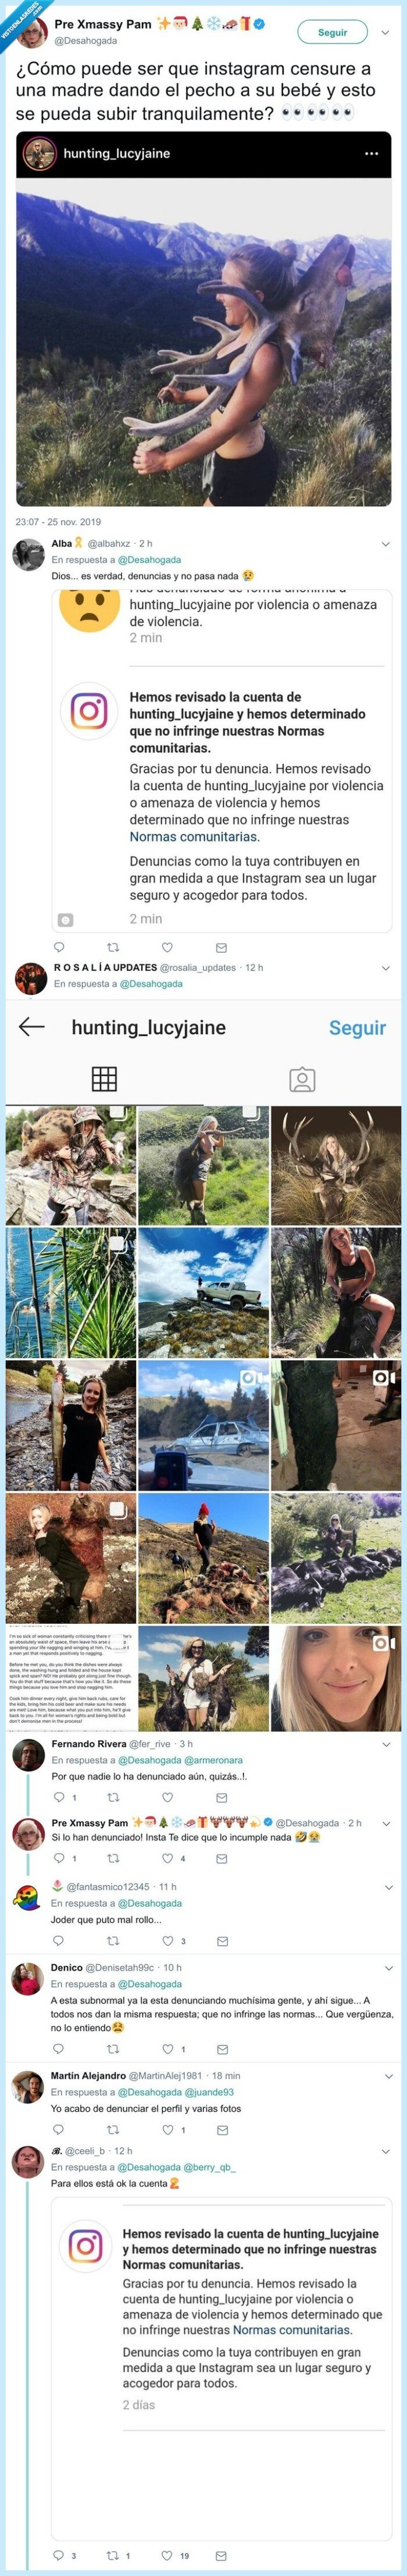 caza,cazadora,denuncias,instagram,perfil